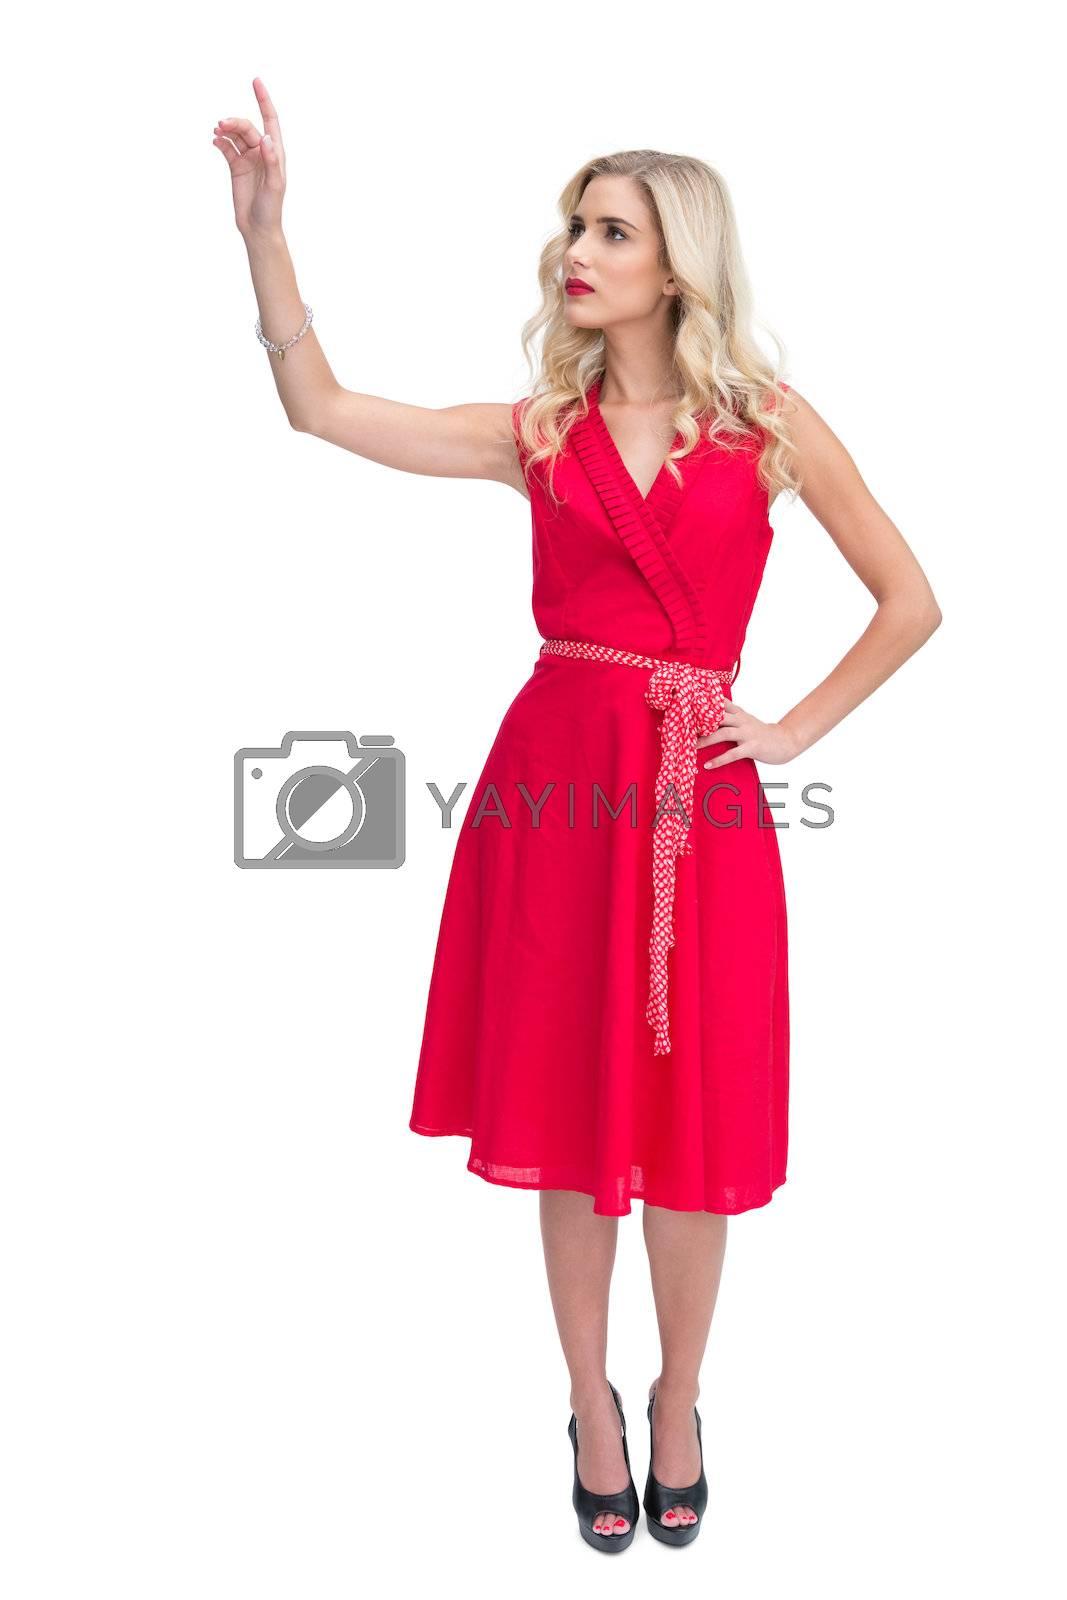 Cheerful woman in red dress waving by Wavebreakmedia